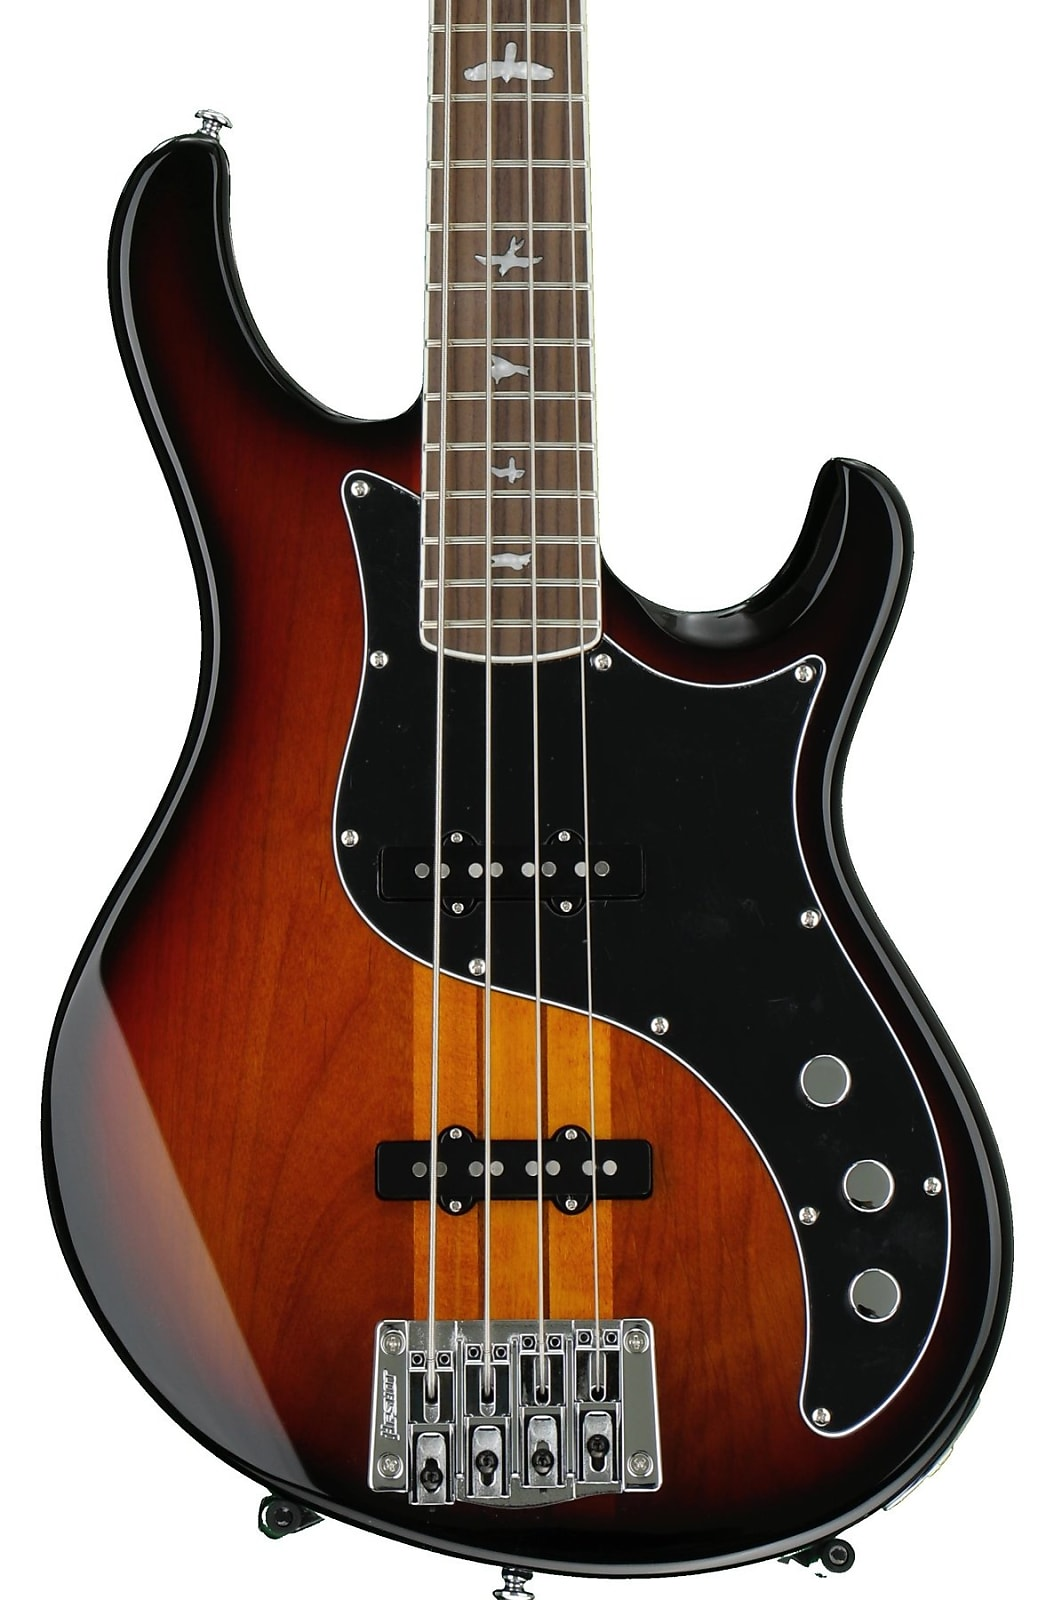 Paul Reed Smith PRS SE Kestrel Bass Electric Bass Tri-Color Sunburst